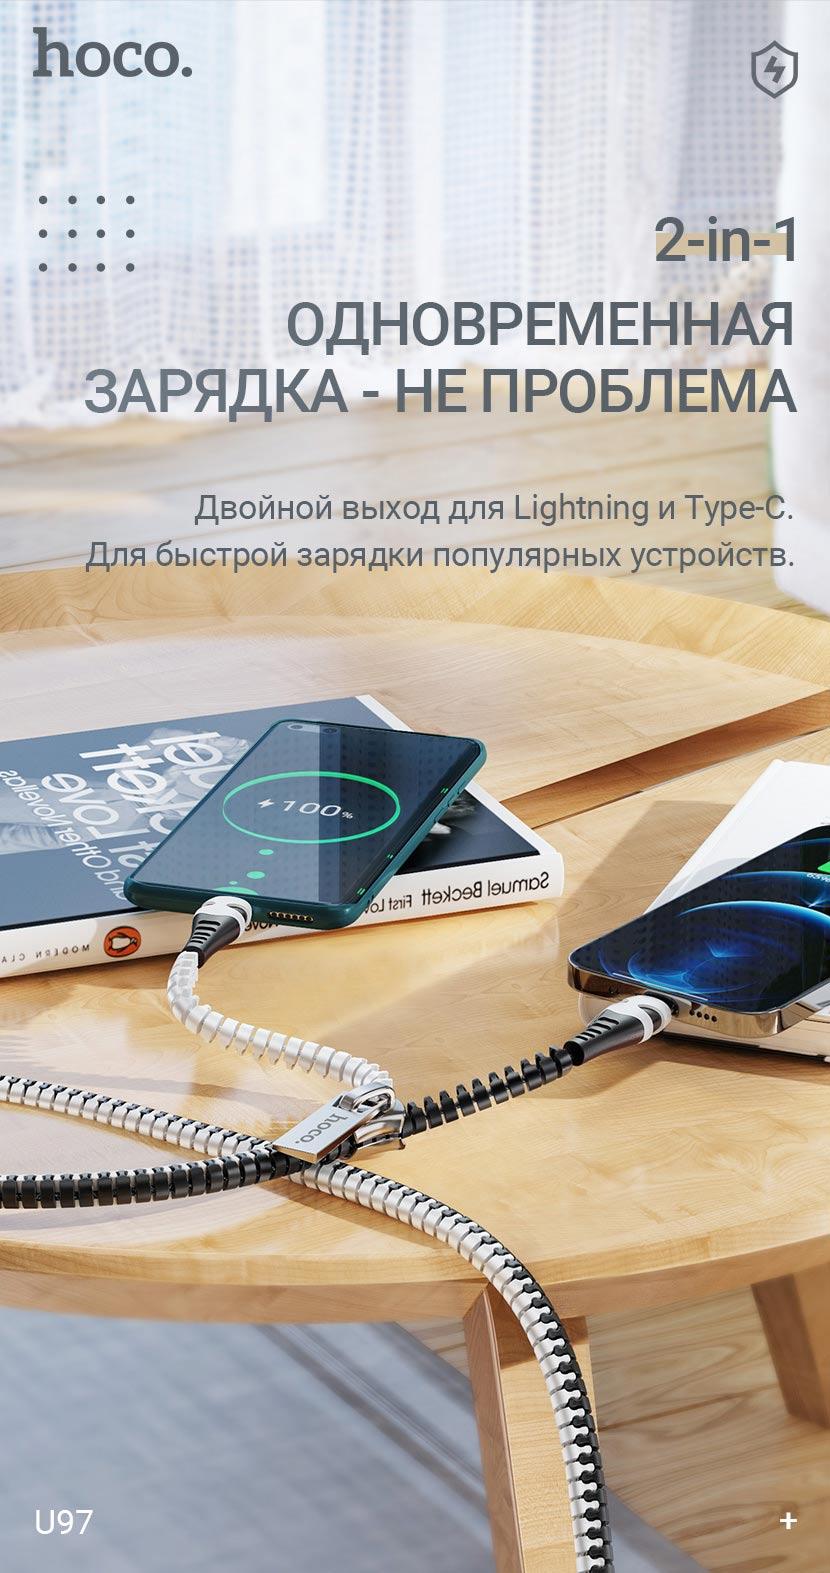 hoco news u97 2in1 zipper charging cable lightning type c charging ru